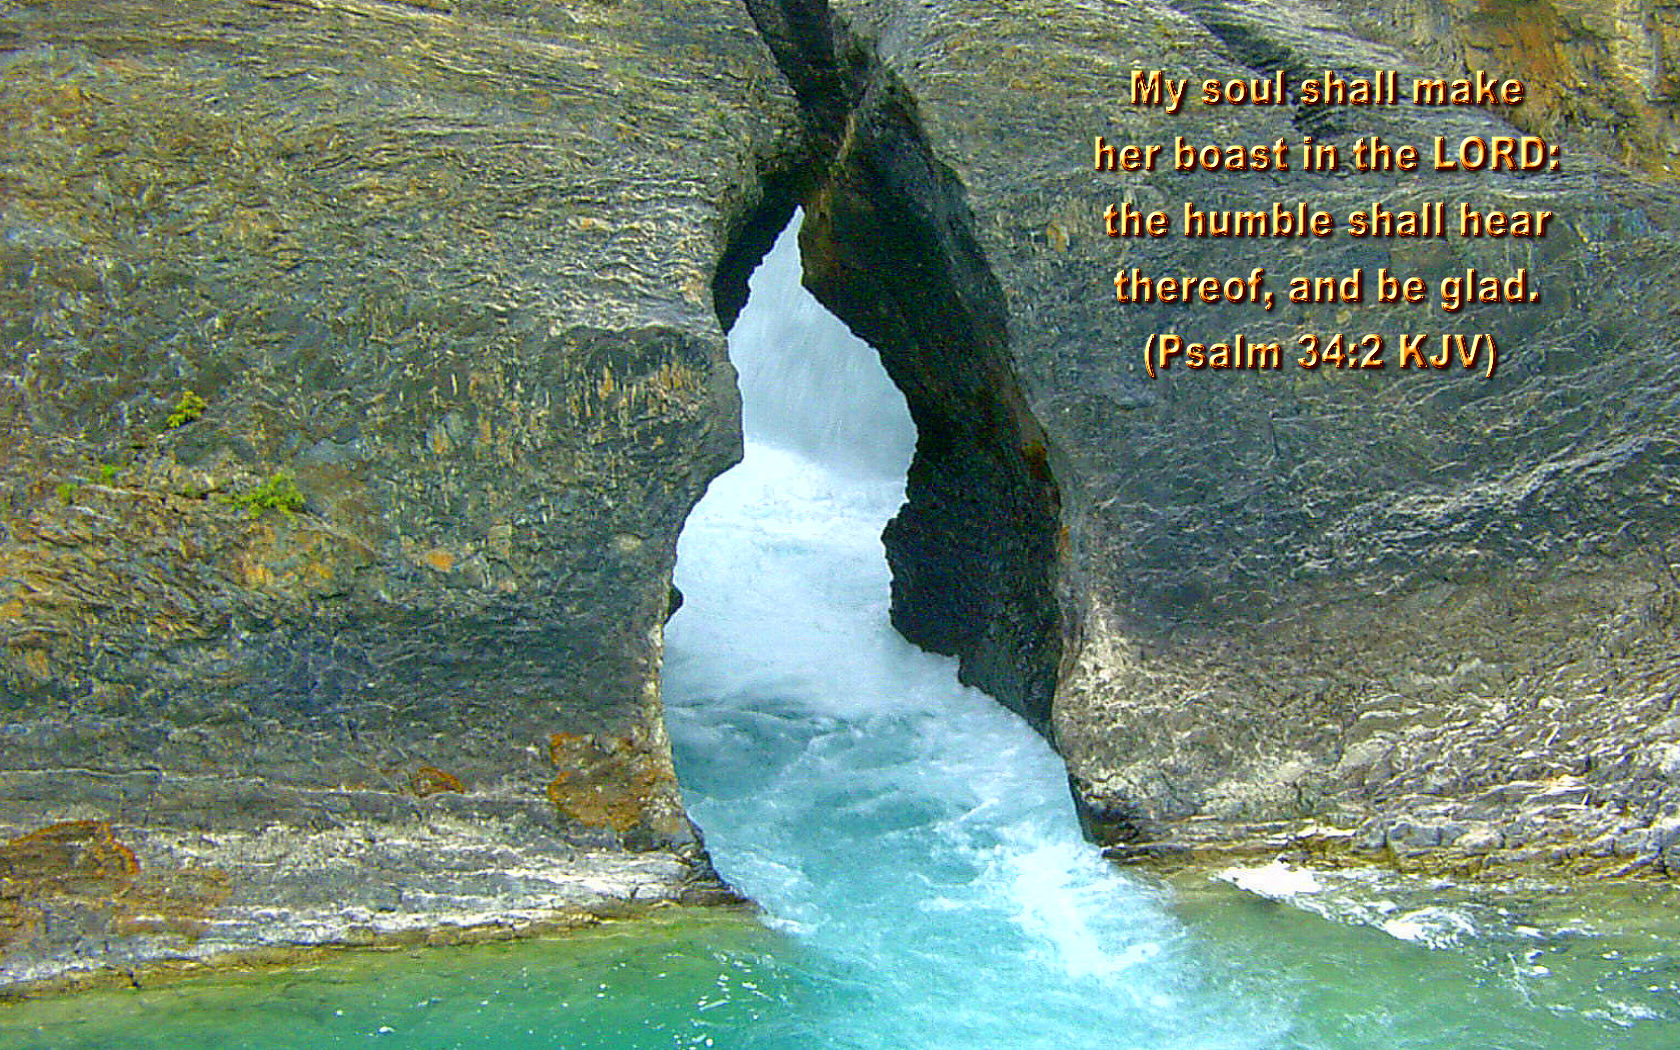 wwwturnbacktogodcomscenic wallpapers with bible verses set 04 1680x1050